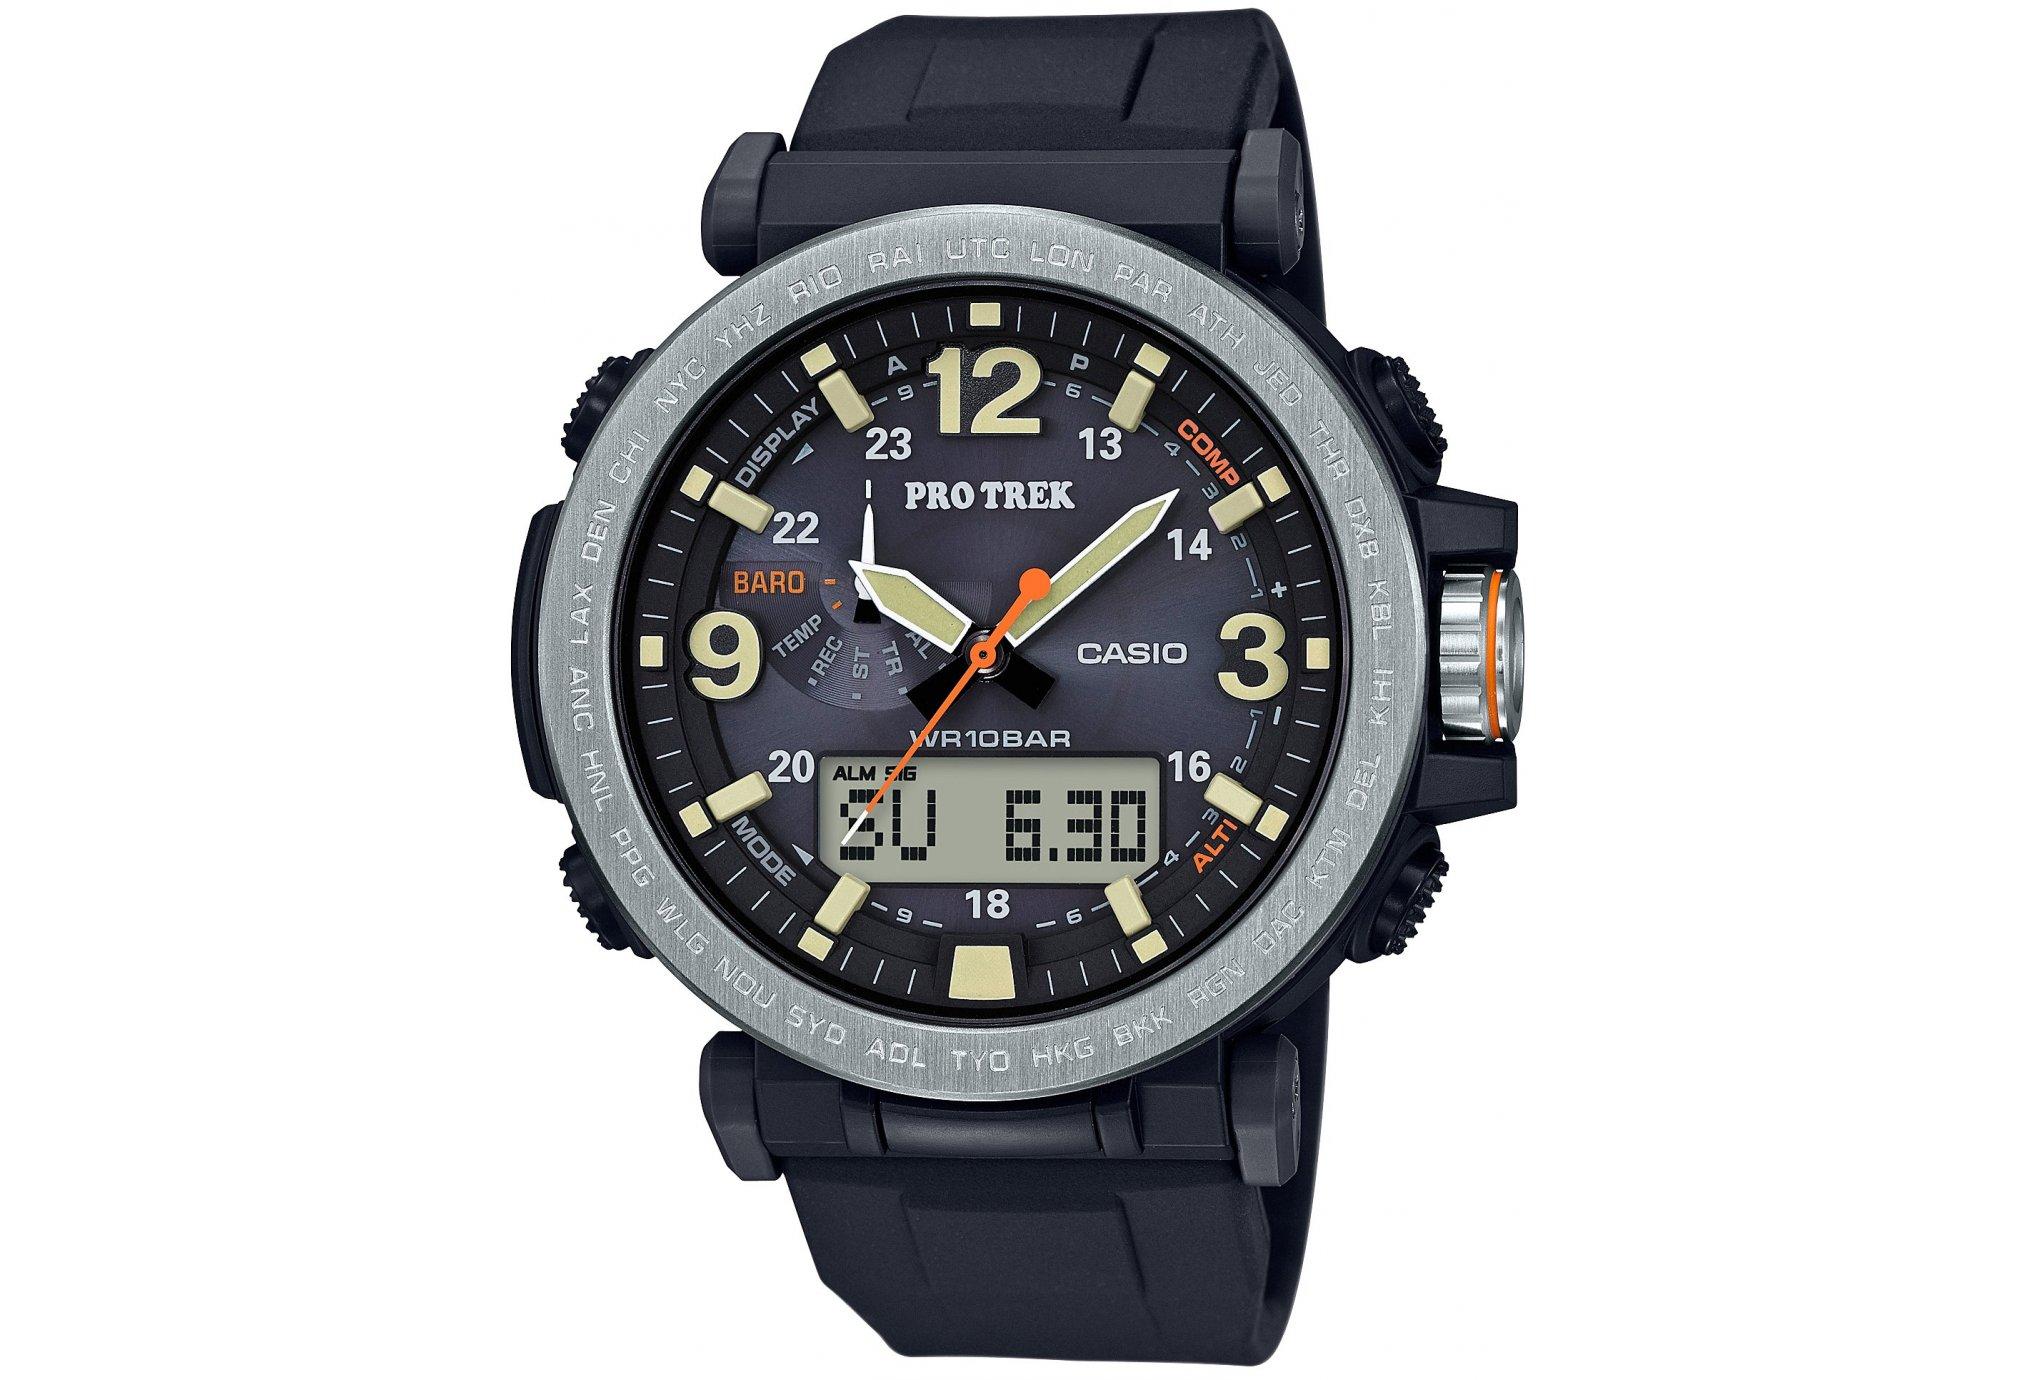 Casio Prg-600 montres de sport